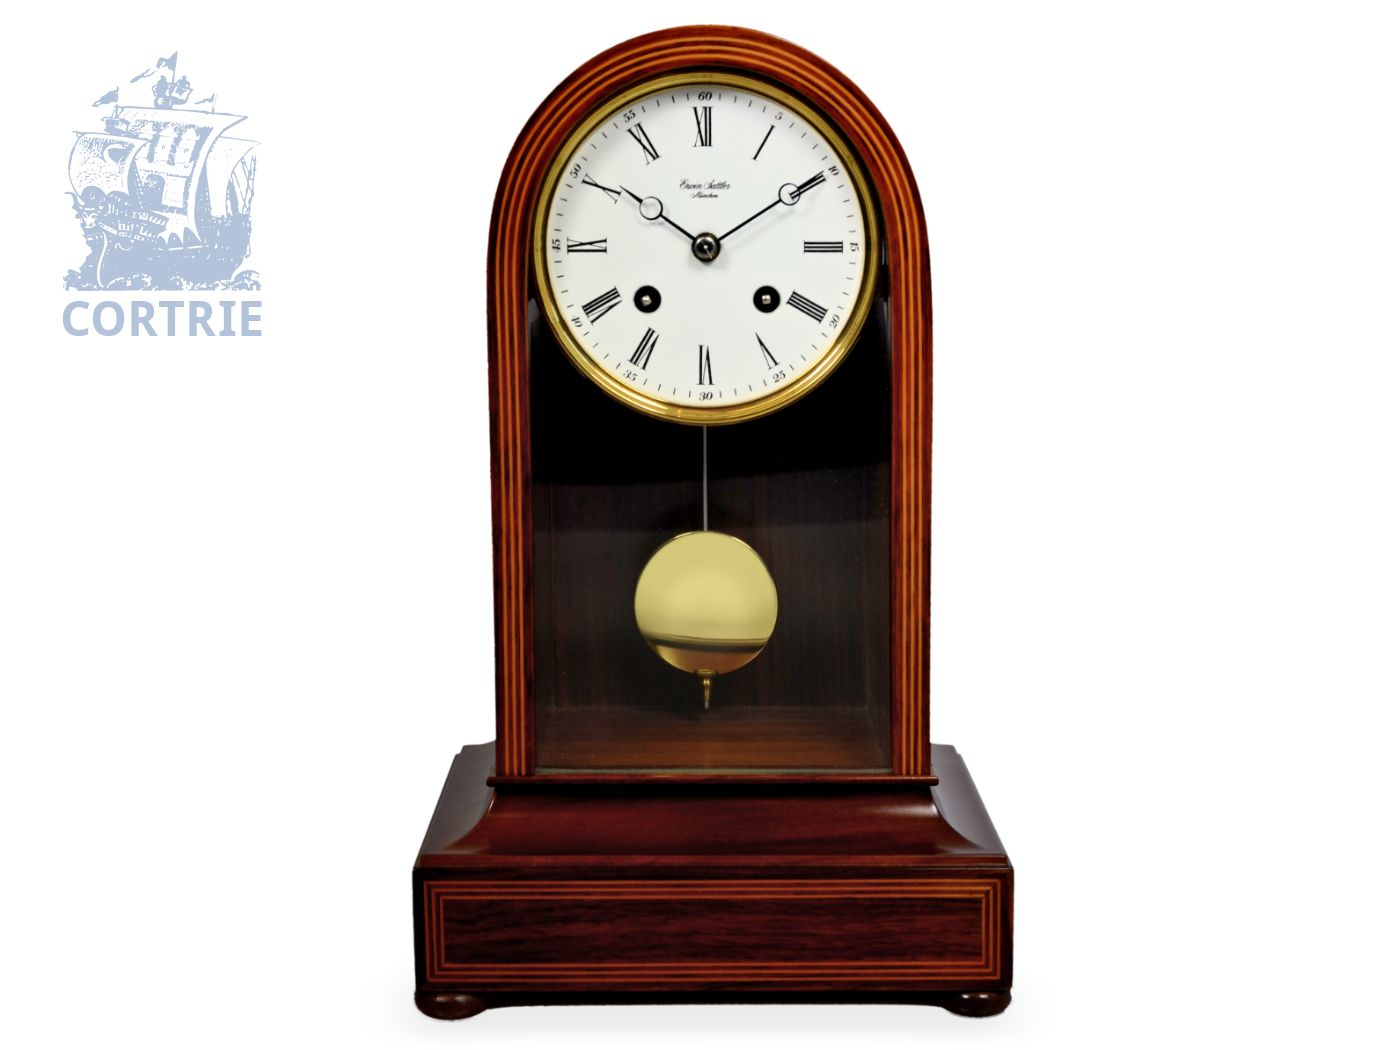 Table clock: fine Sattler clock, Erwin Sattler Munich, ref. 1113, Parisian striking, 8-days-movement, like new, original box and certificate-